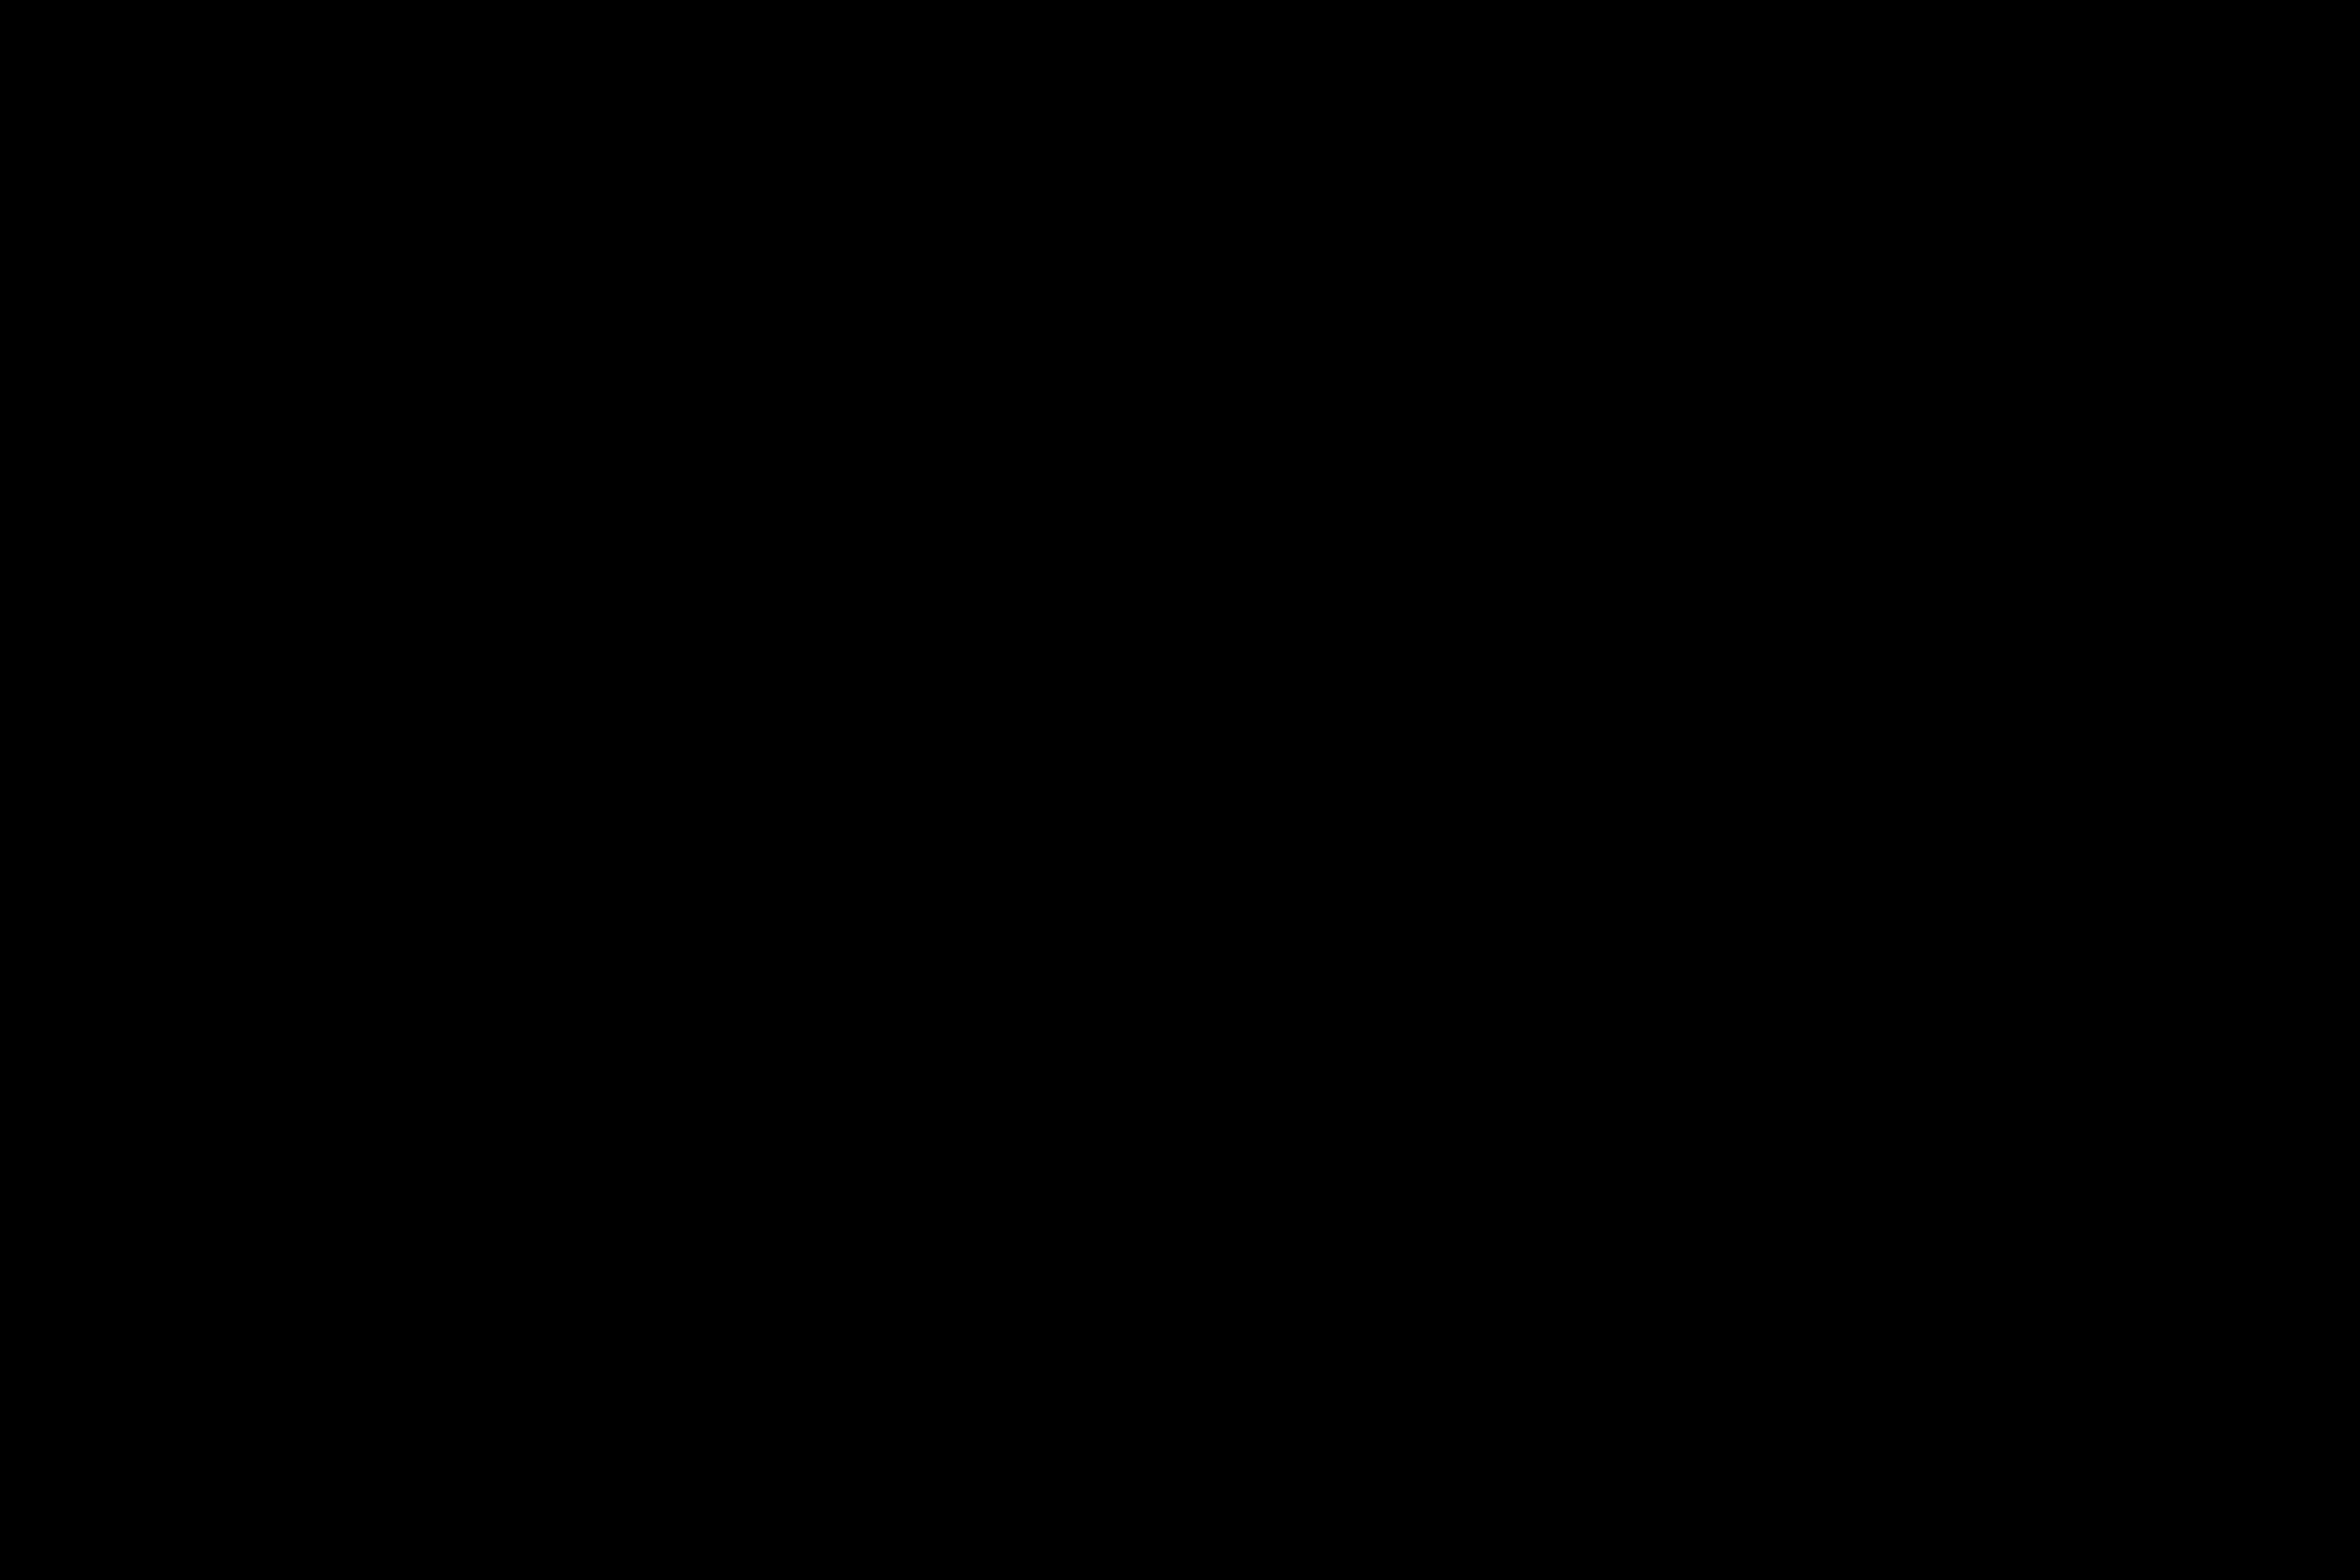 BLACKFIN INTRODUCES AURA